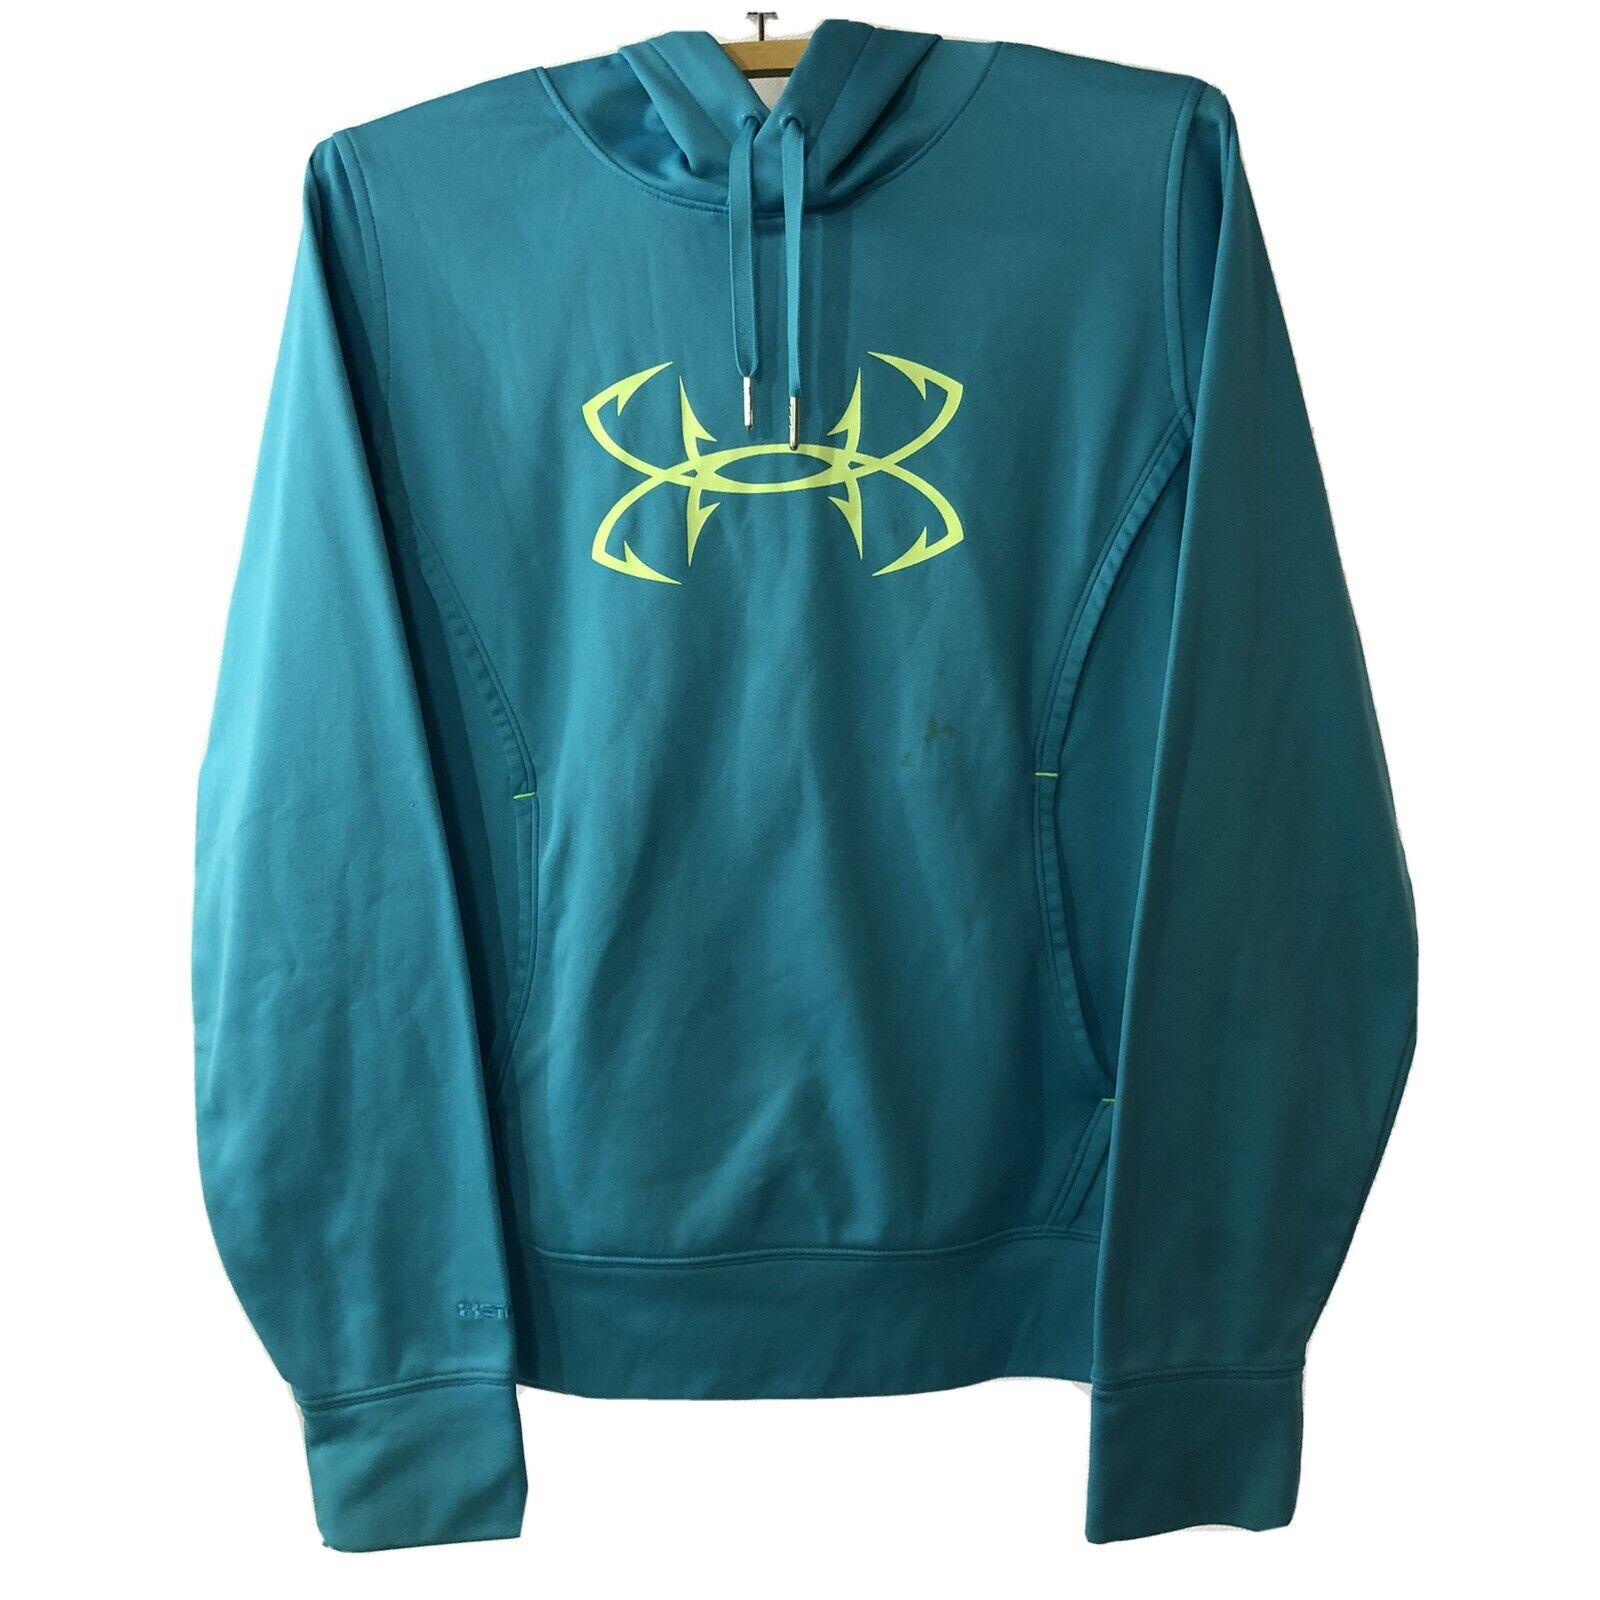 Under Armour Storm 1 Womens Sz Sm/P Hoodie Aqua Blue Fish Hook Logo Long Sleeve